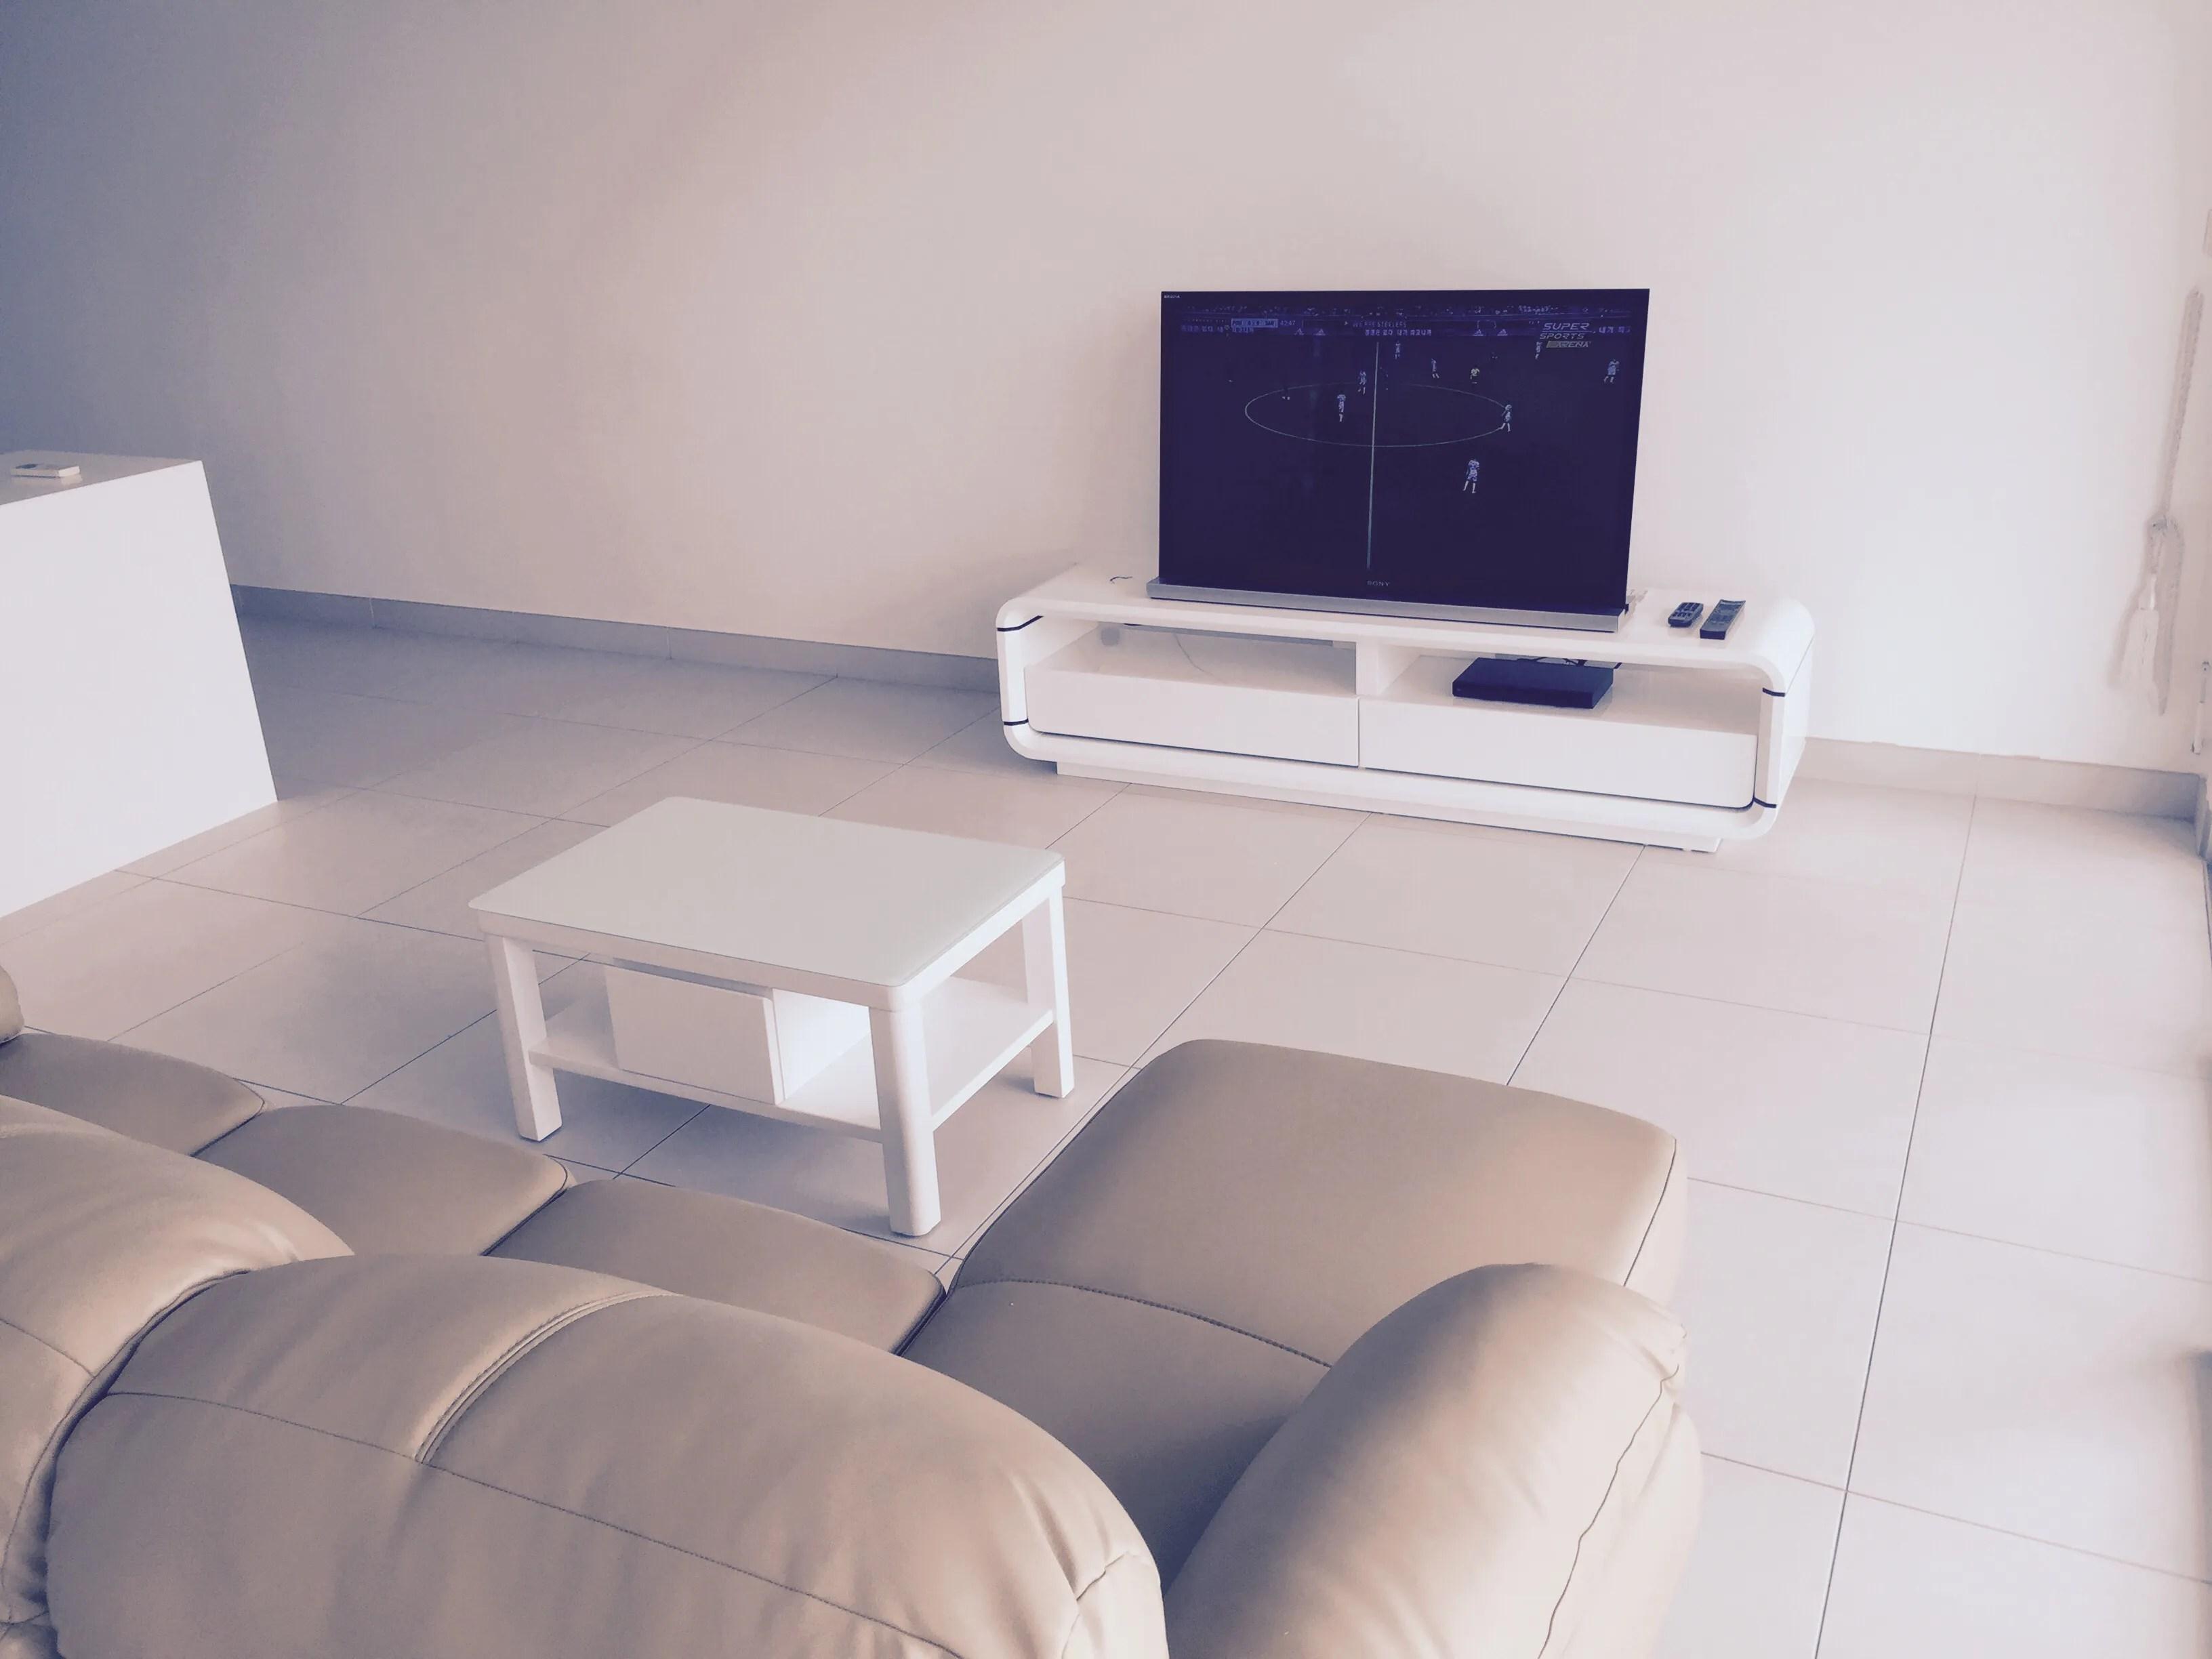 Henry Furnishing – Furniture Rental in Singapore Since 1994